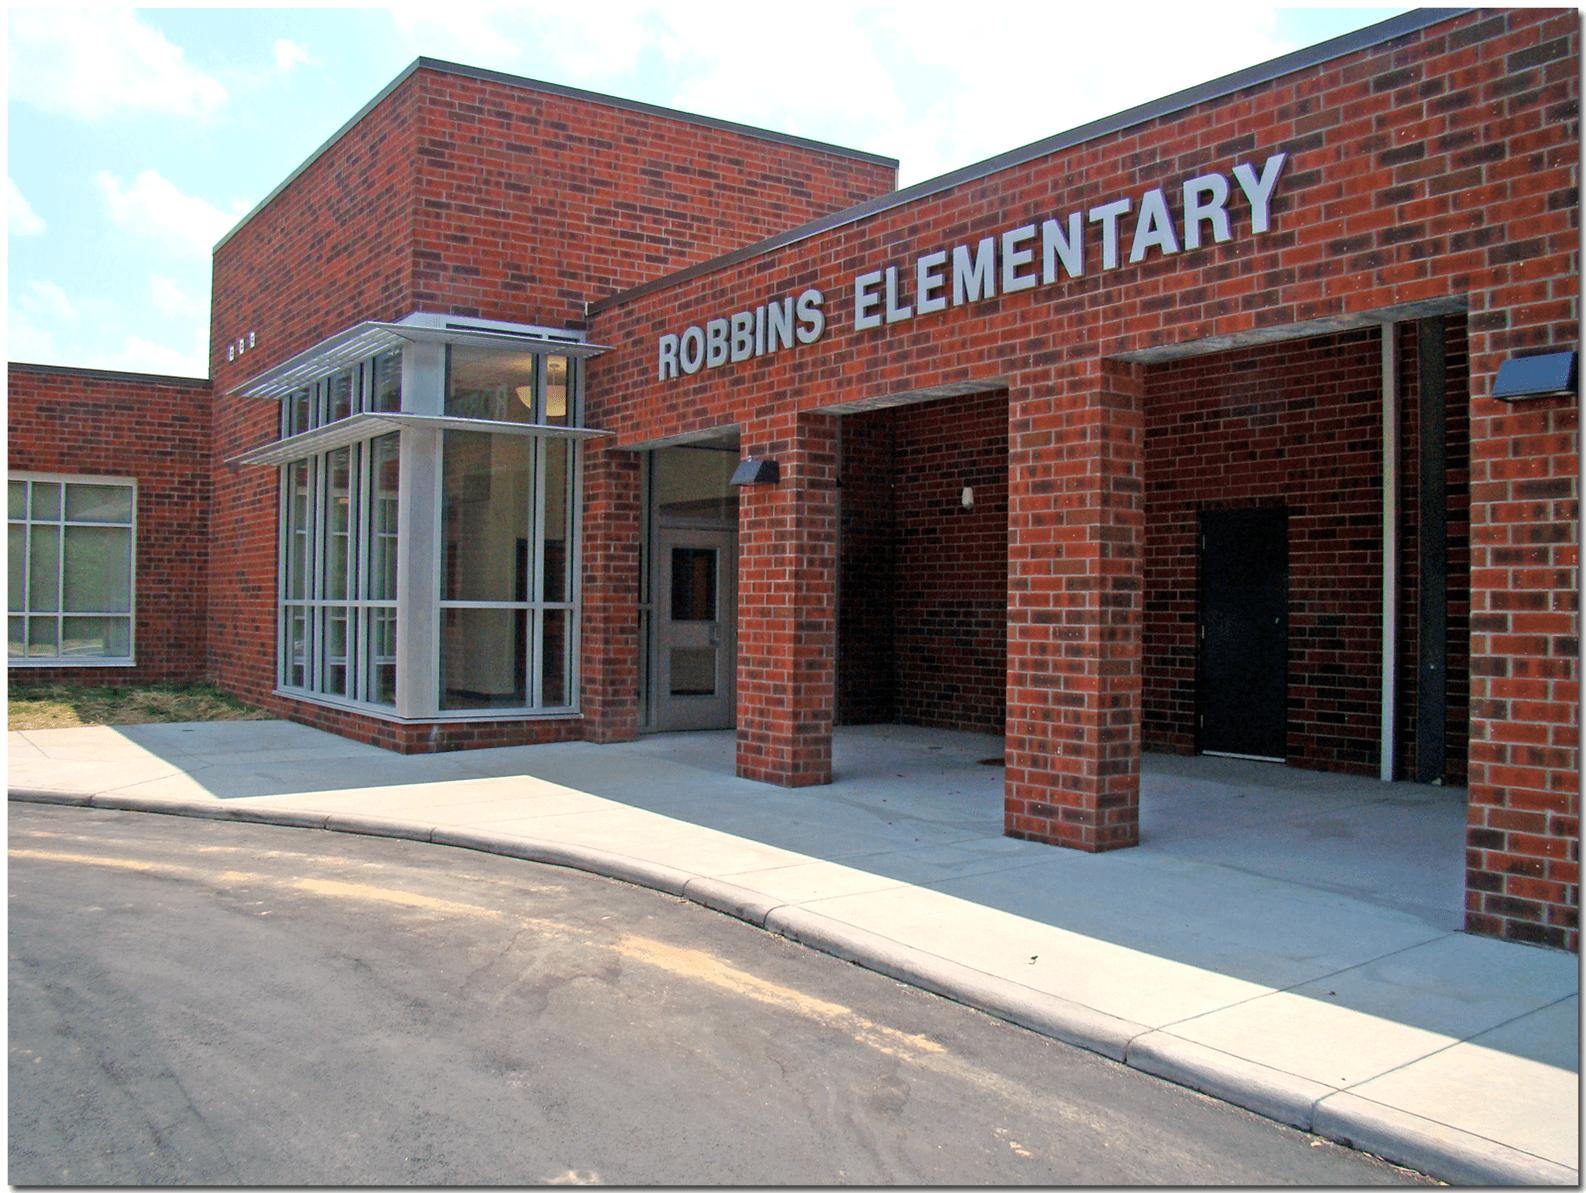 Robbins elementary exterior